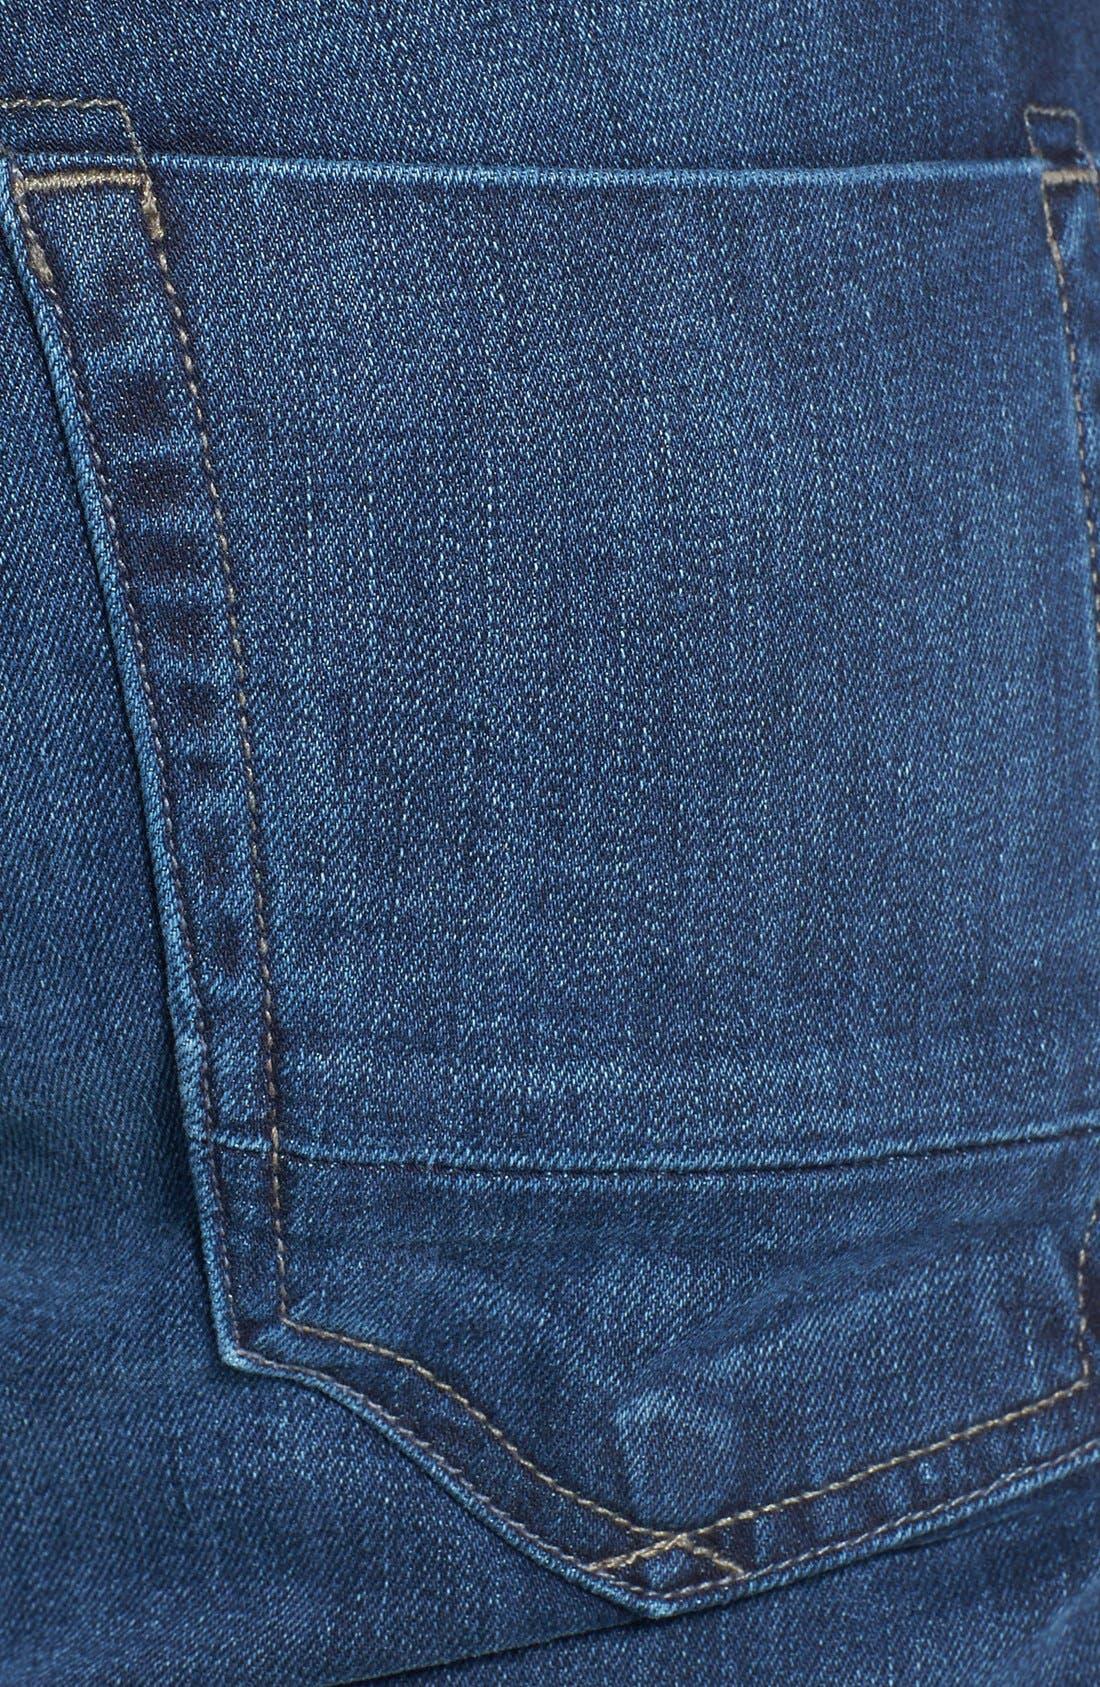 'Pragmatist Big Drake 4 Year Flex' Straight Leg Italian Stretch Denim Jeans,                             Alternate thumbnail 2, color,                             421